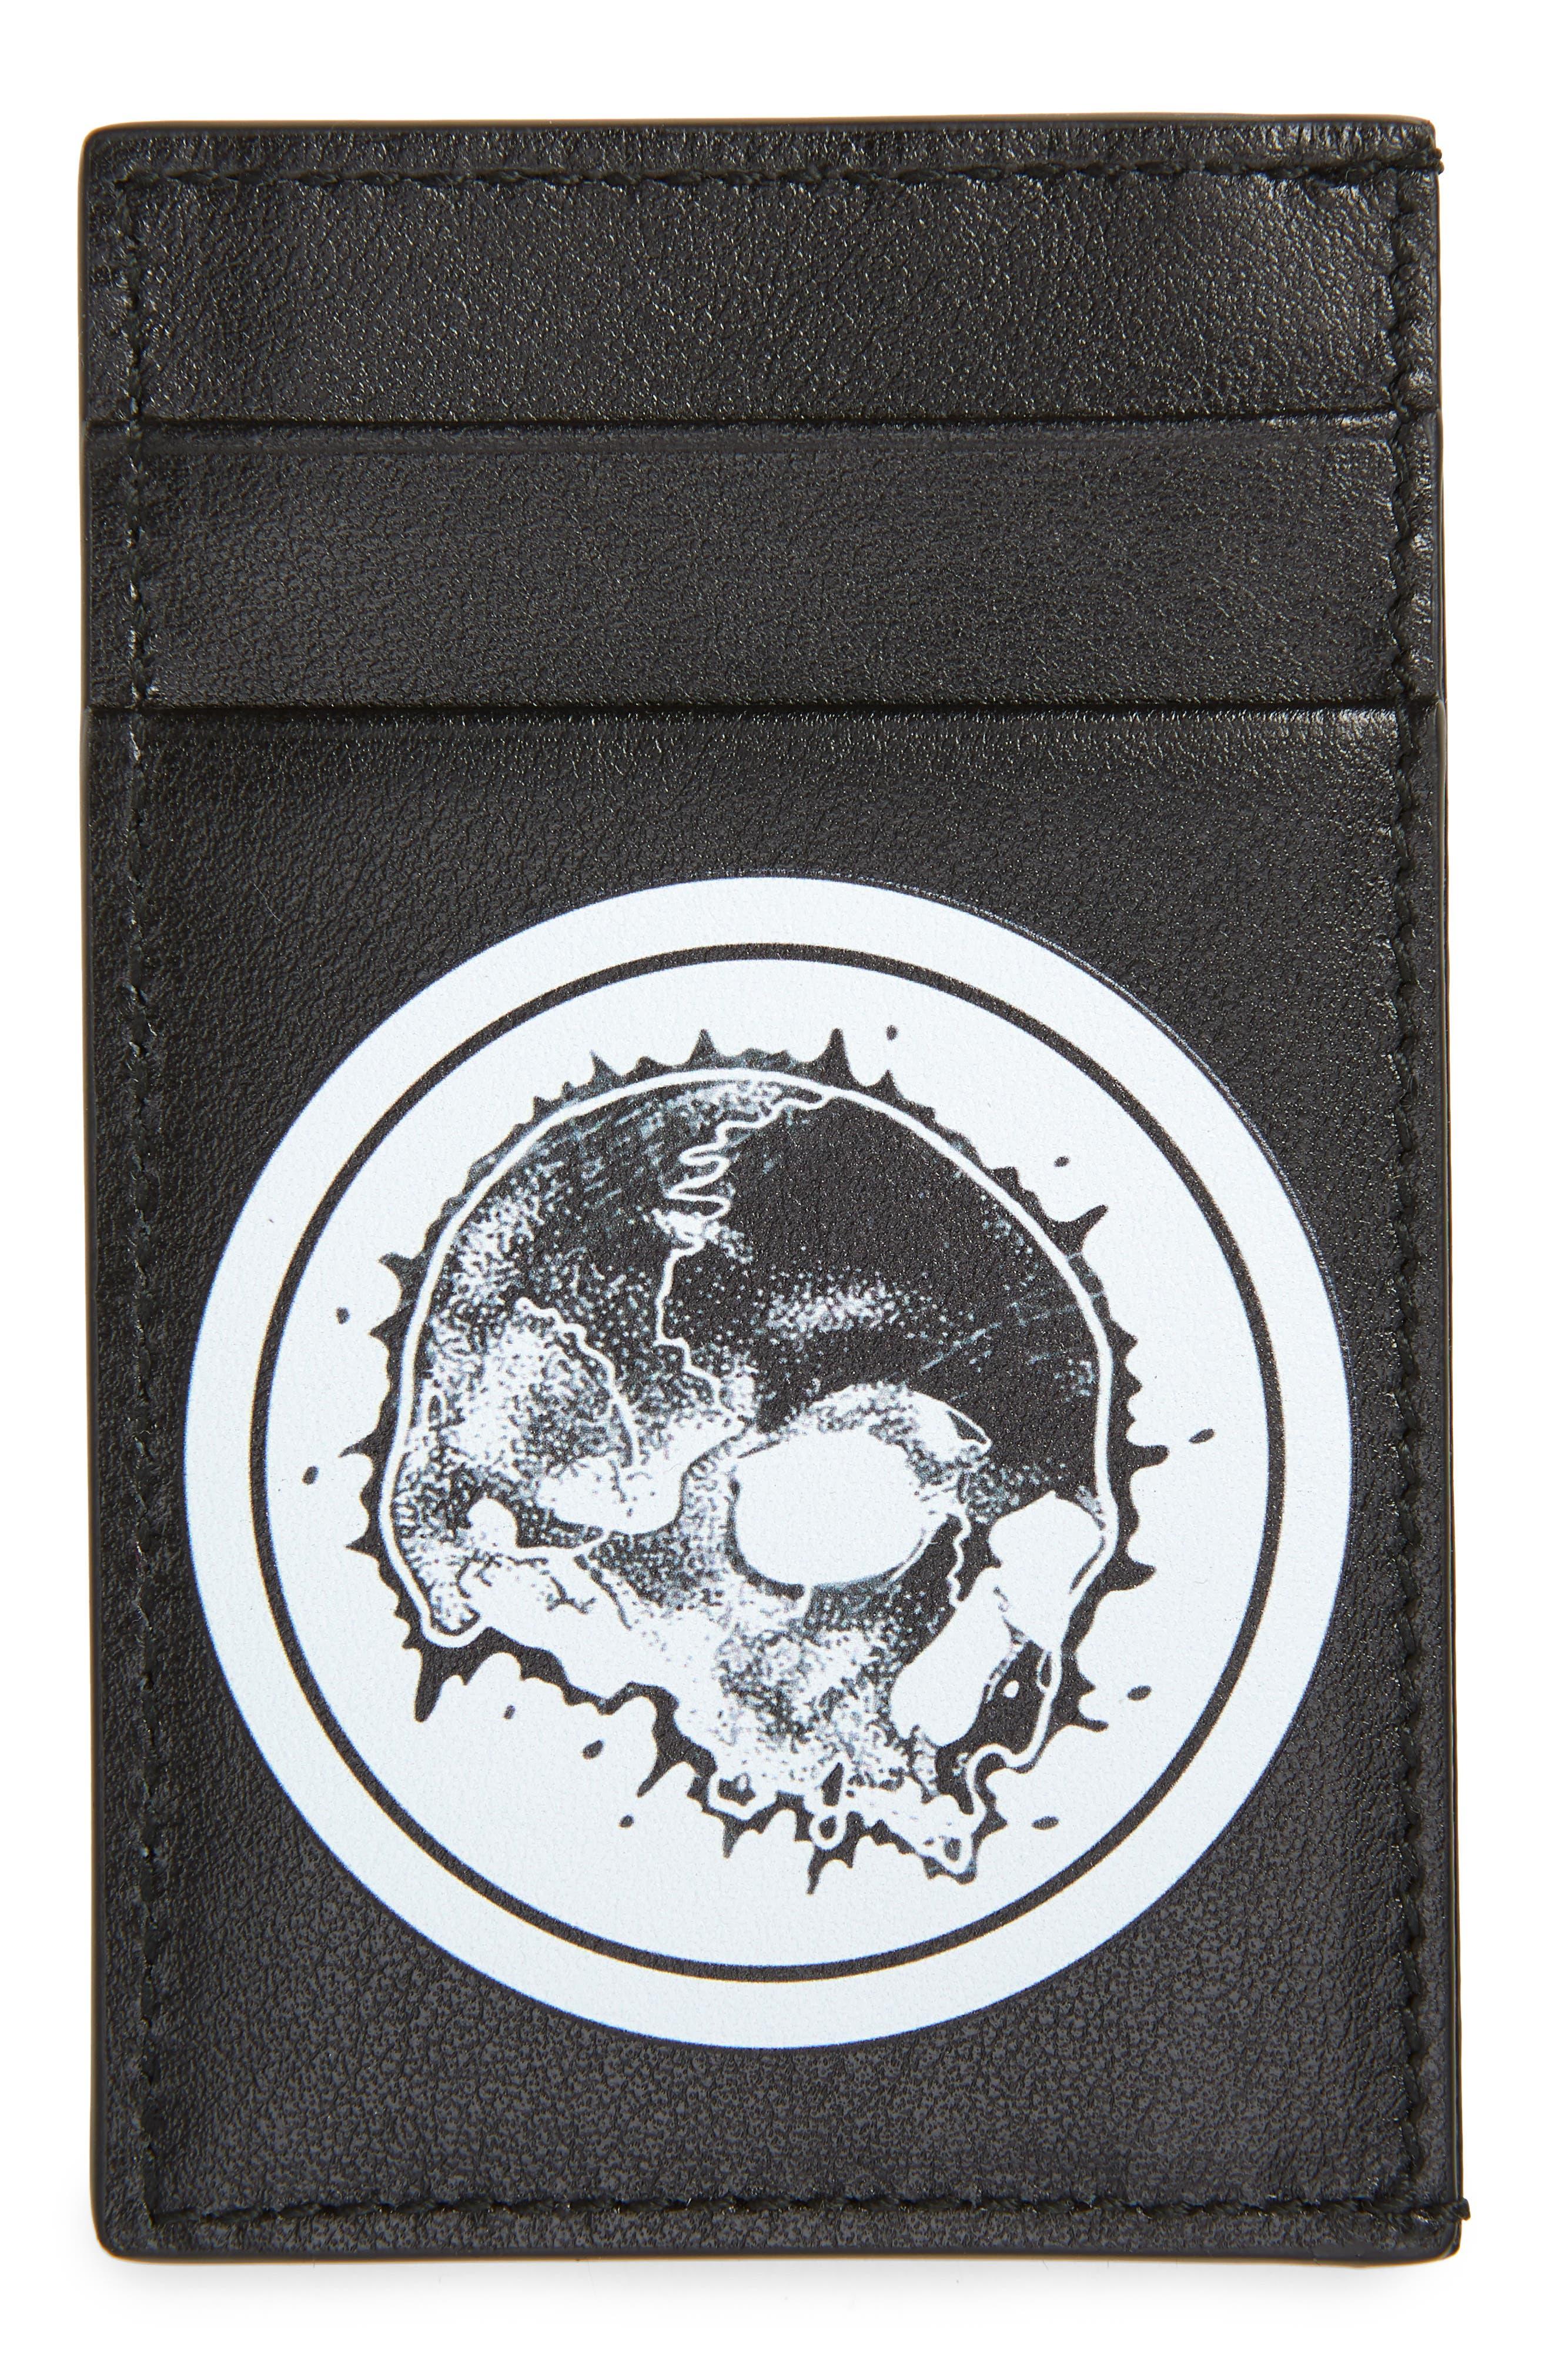 ALEXANDER MCQUEEN, Skull Leather Card Case, Main thumbnail 1, color, BLACK/ WHITE